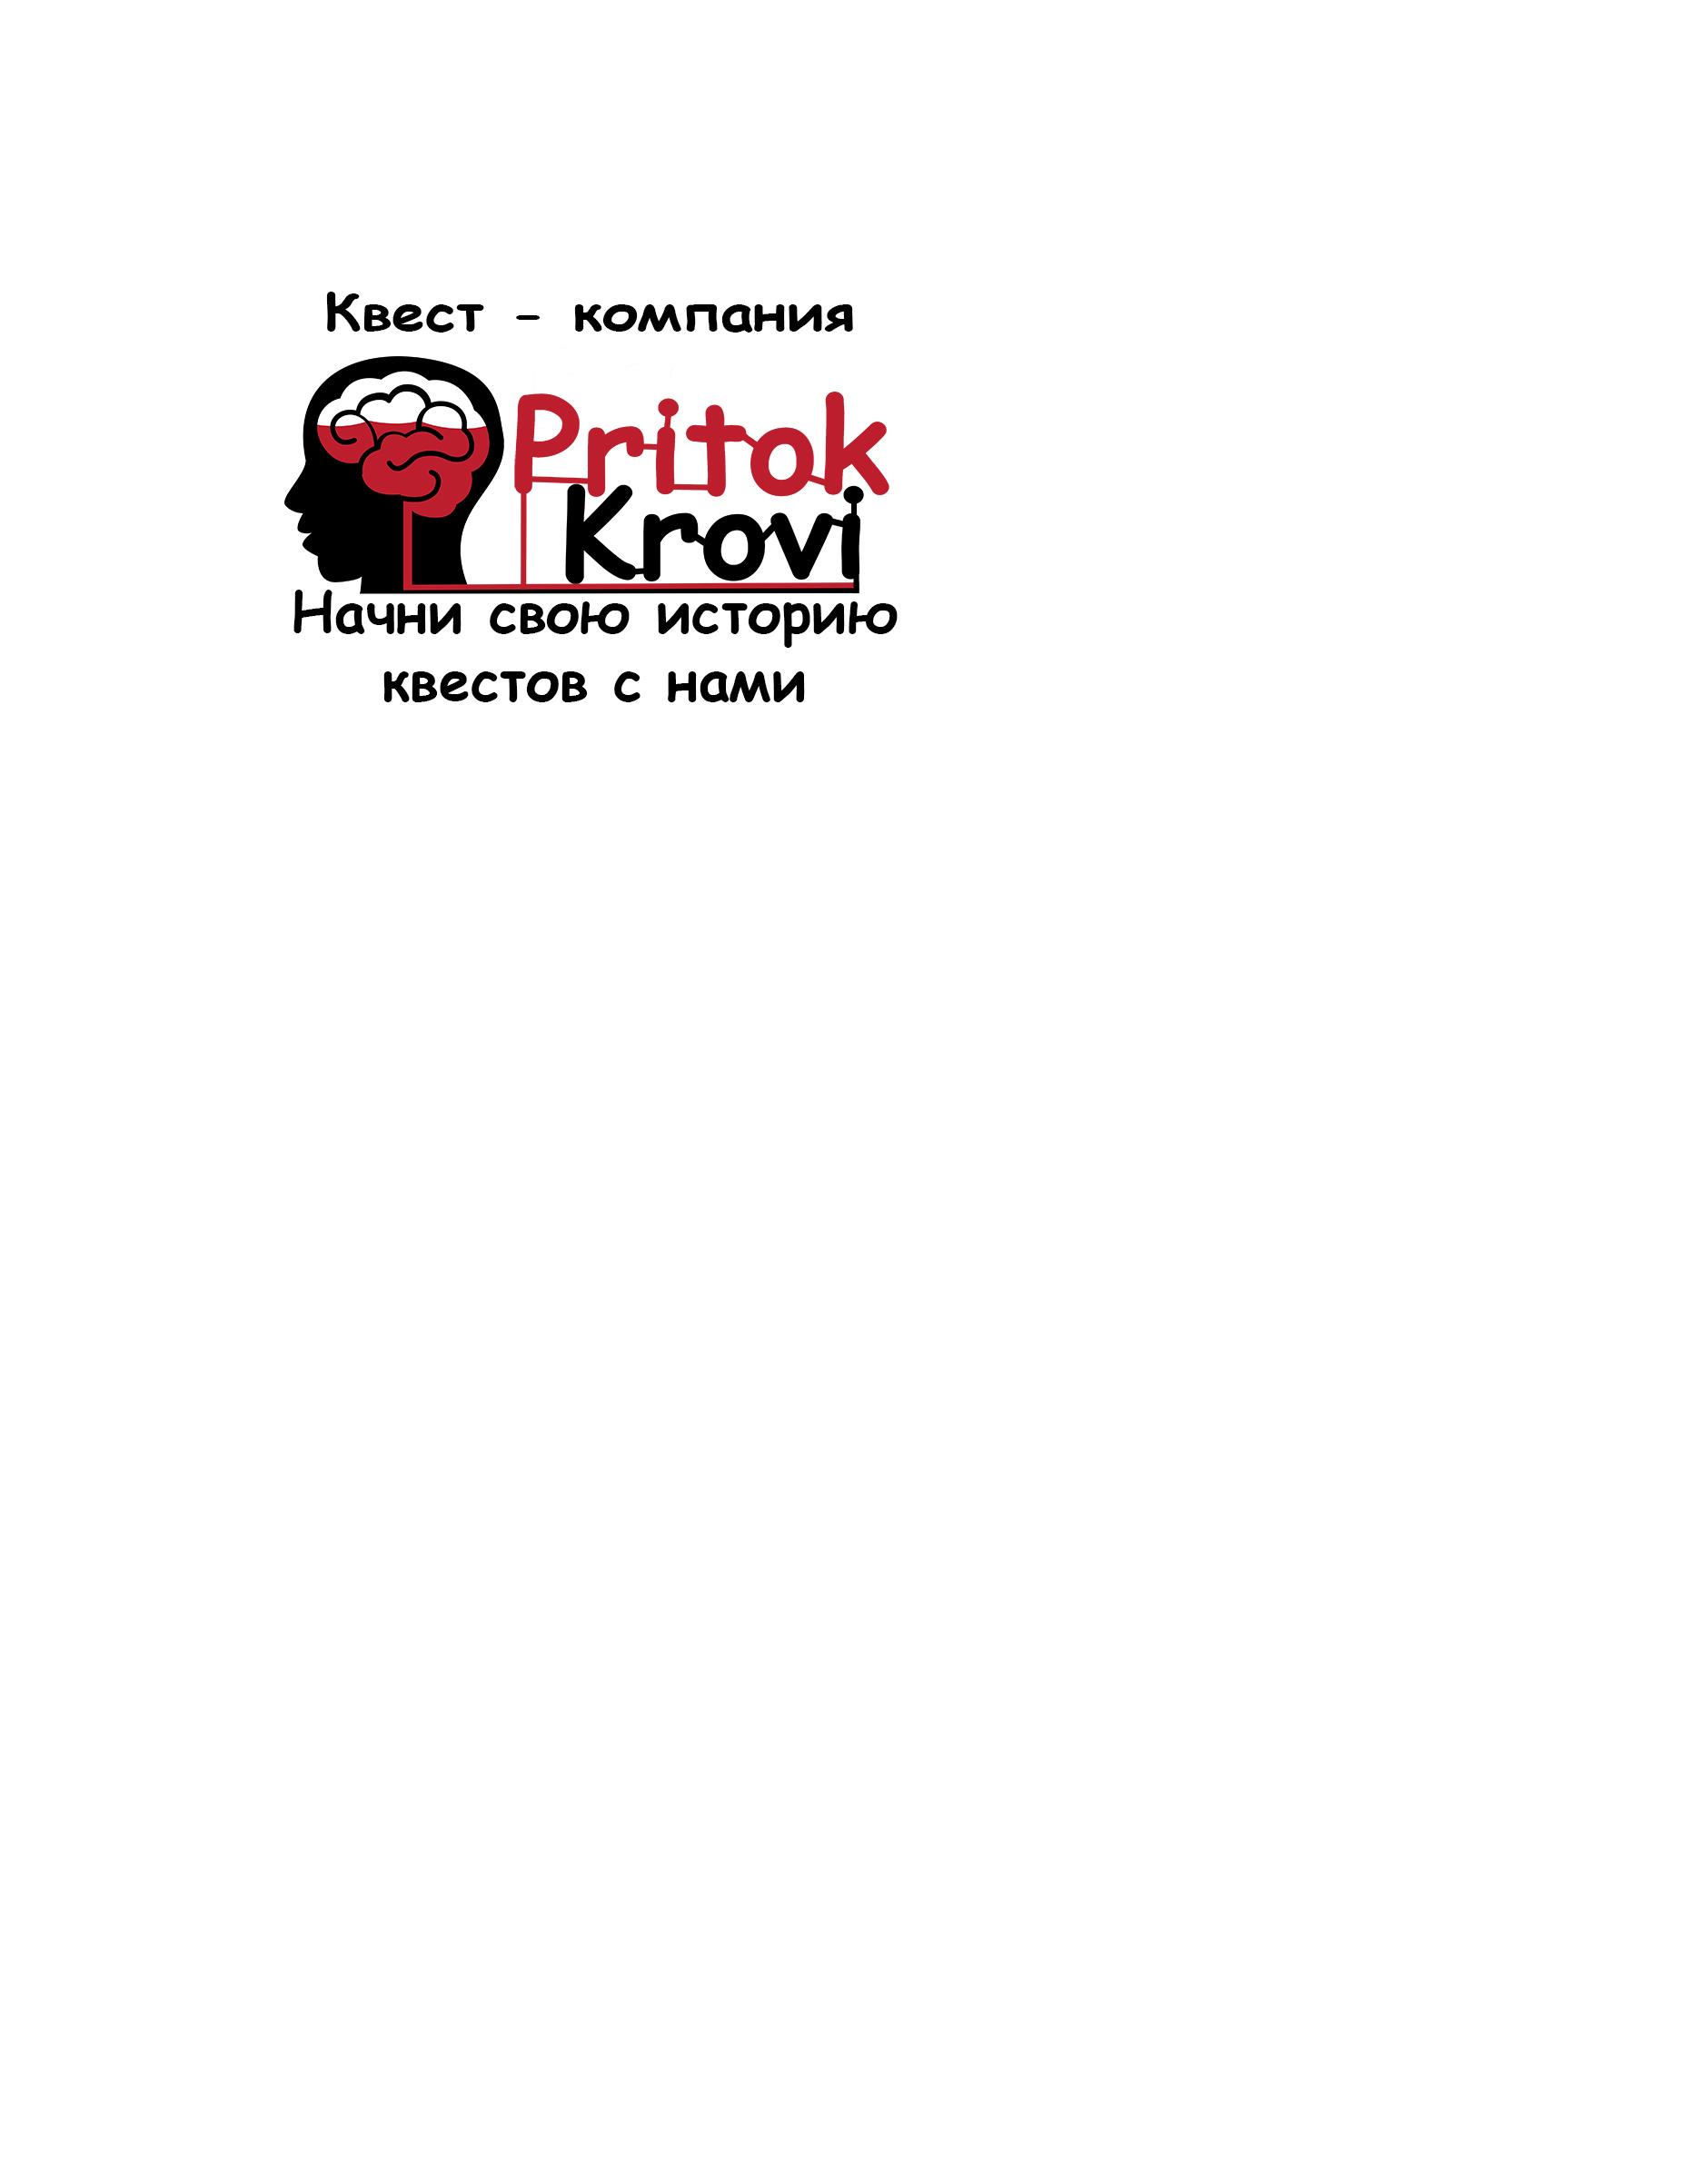 Изображение Pritokkrovi